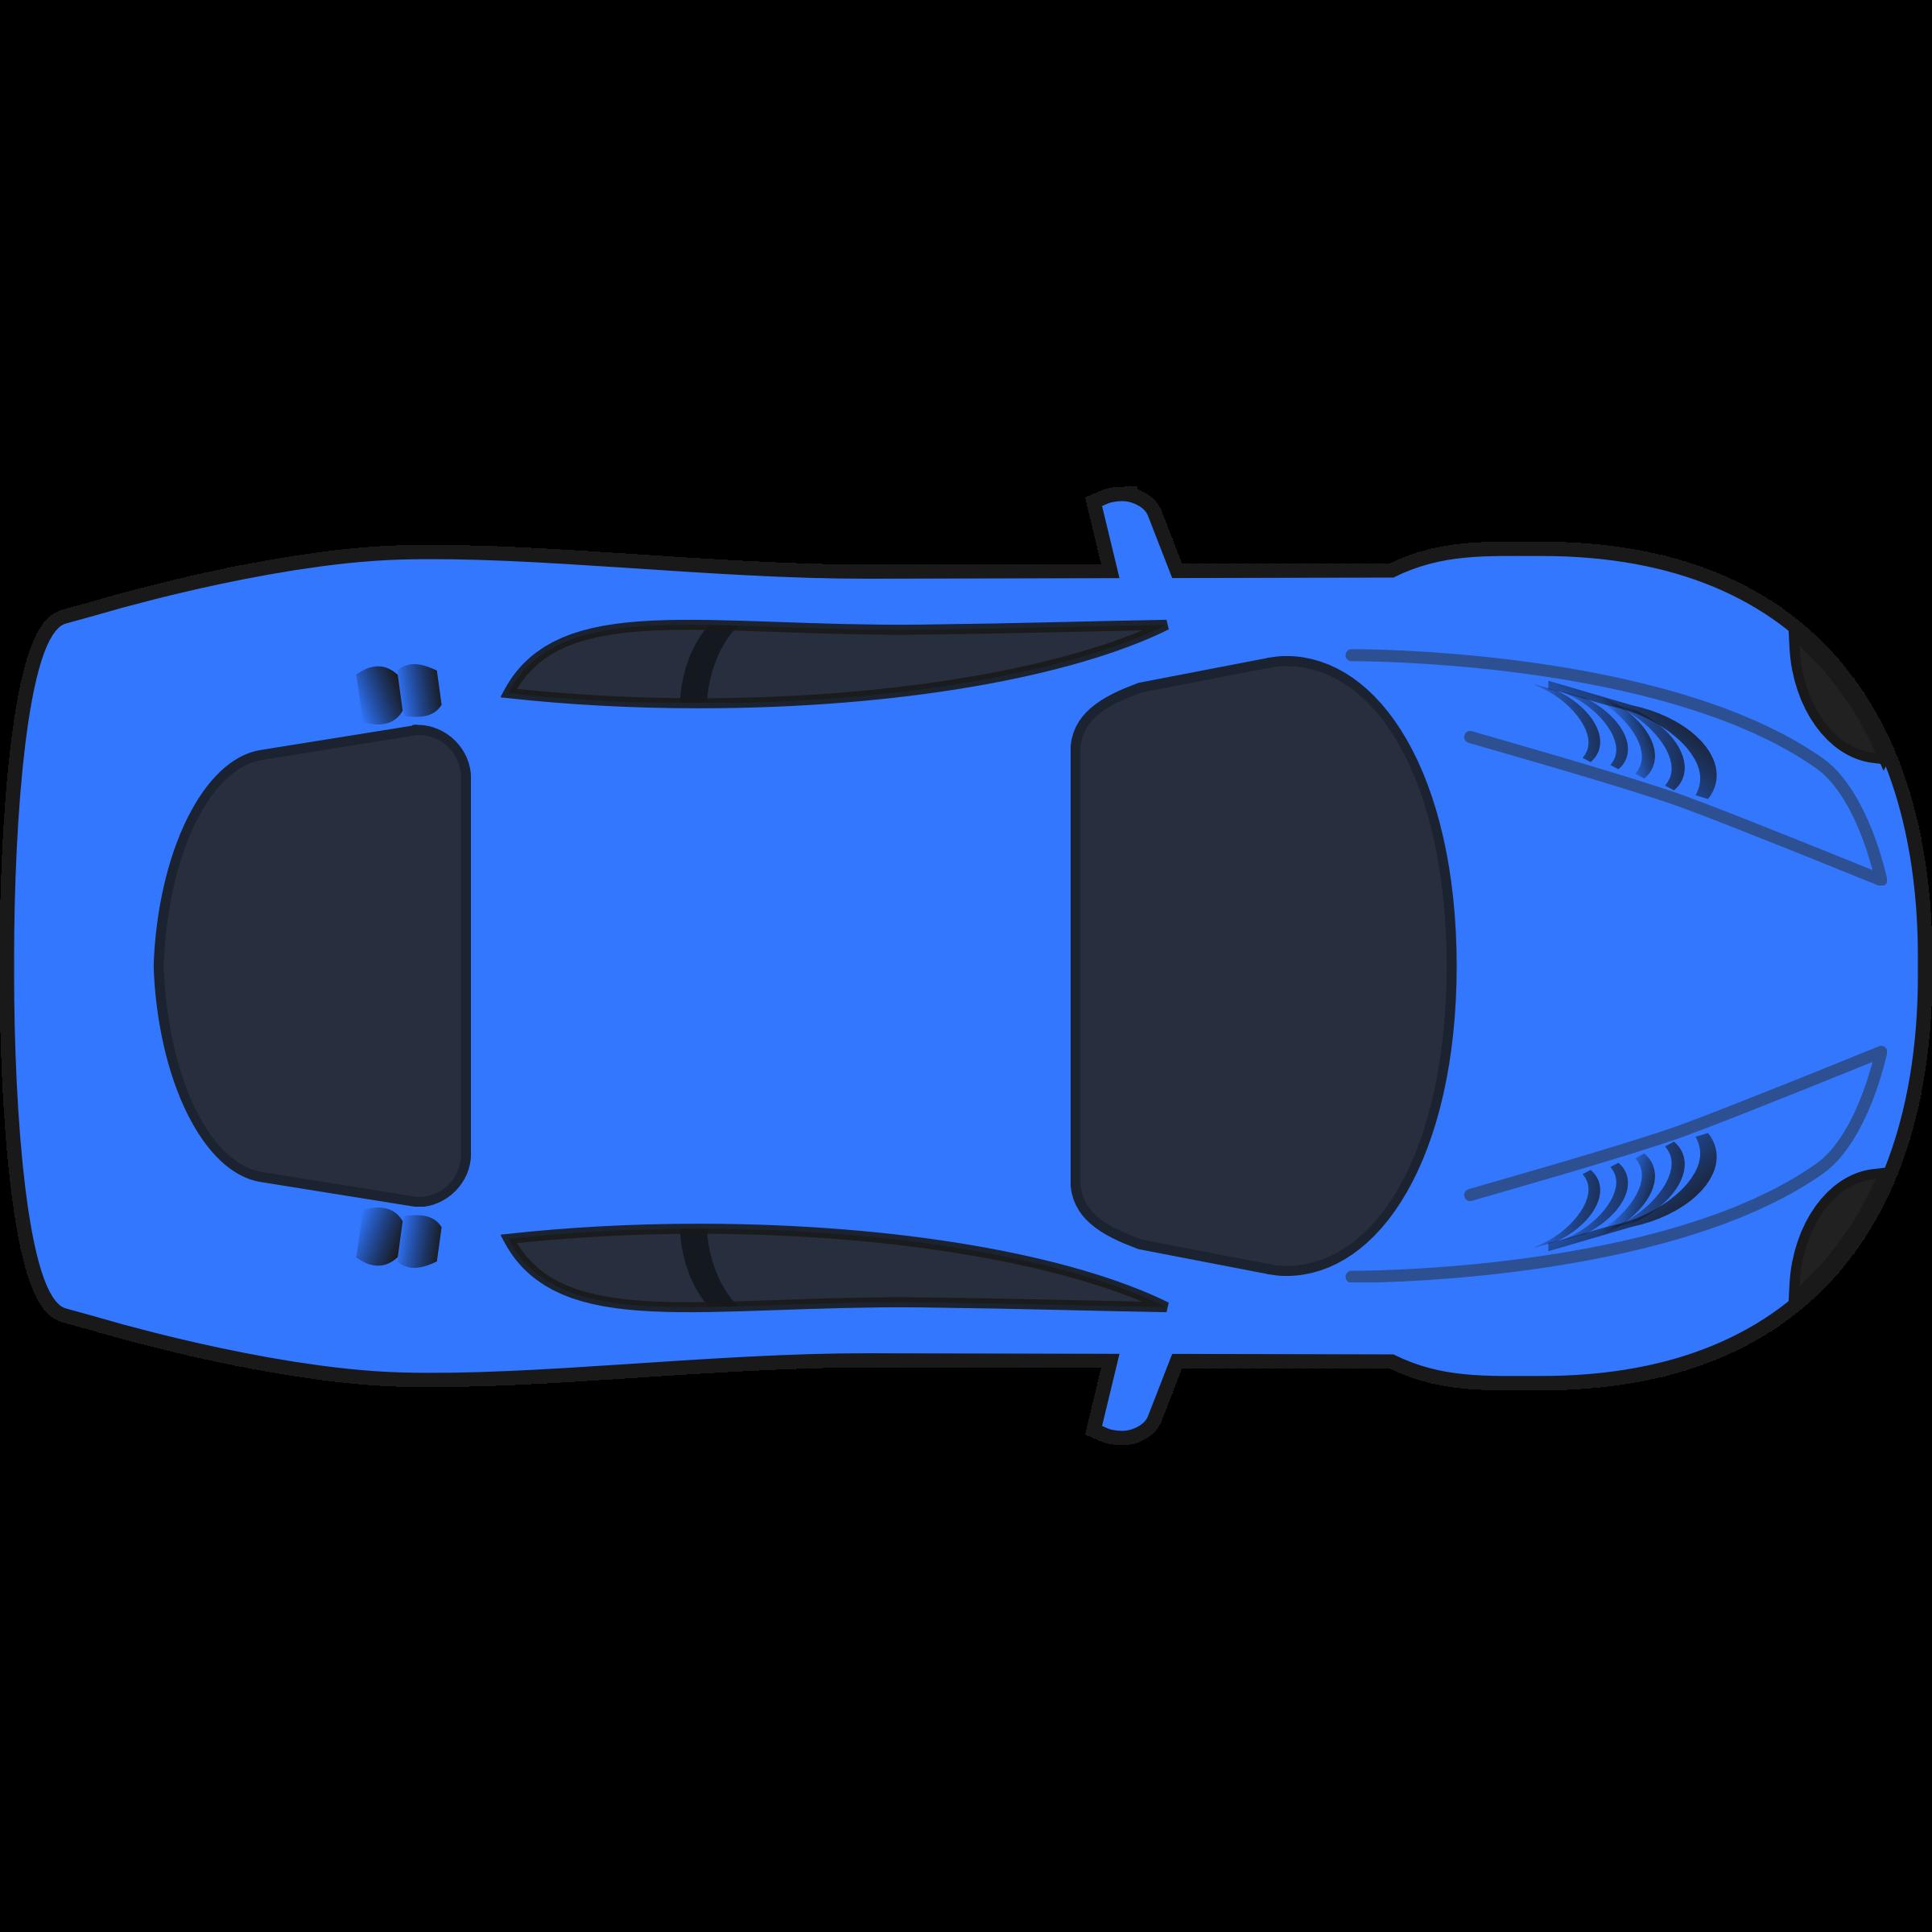 Race jokingart com download. Minivan clipart aerial car